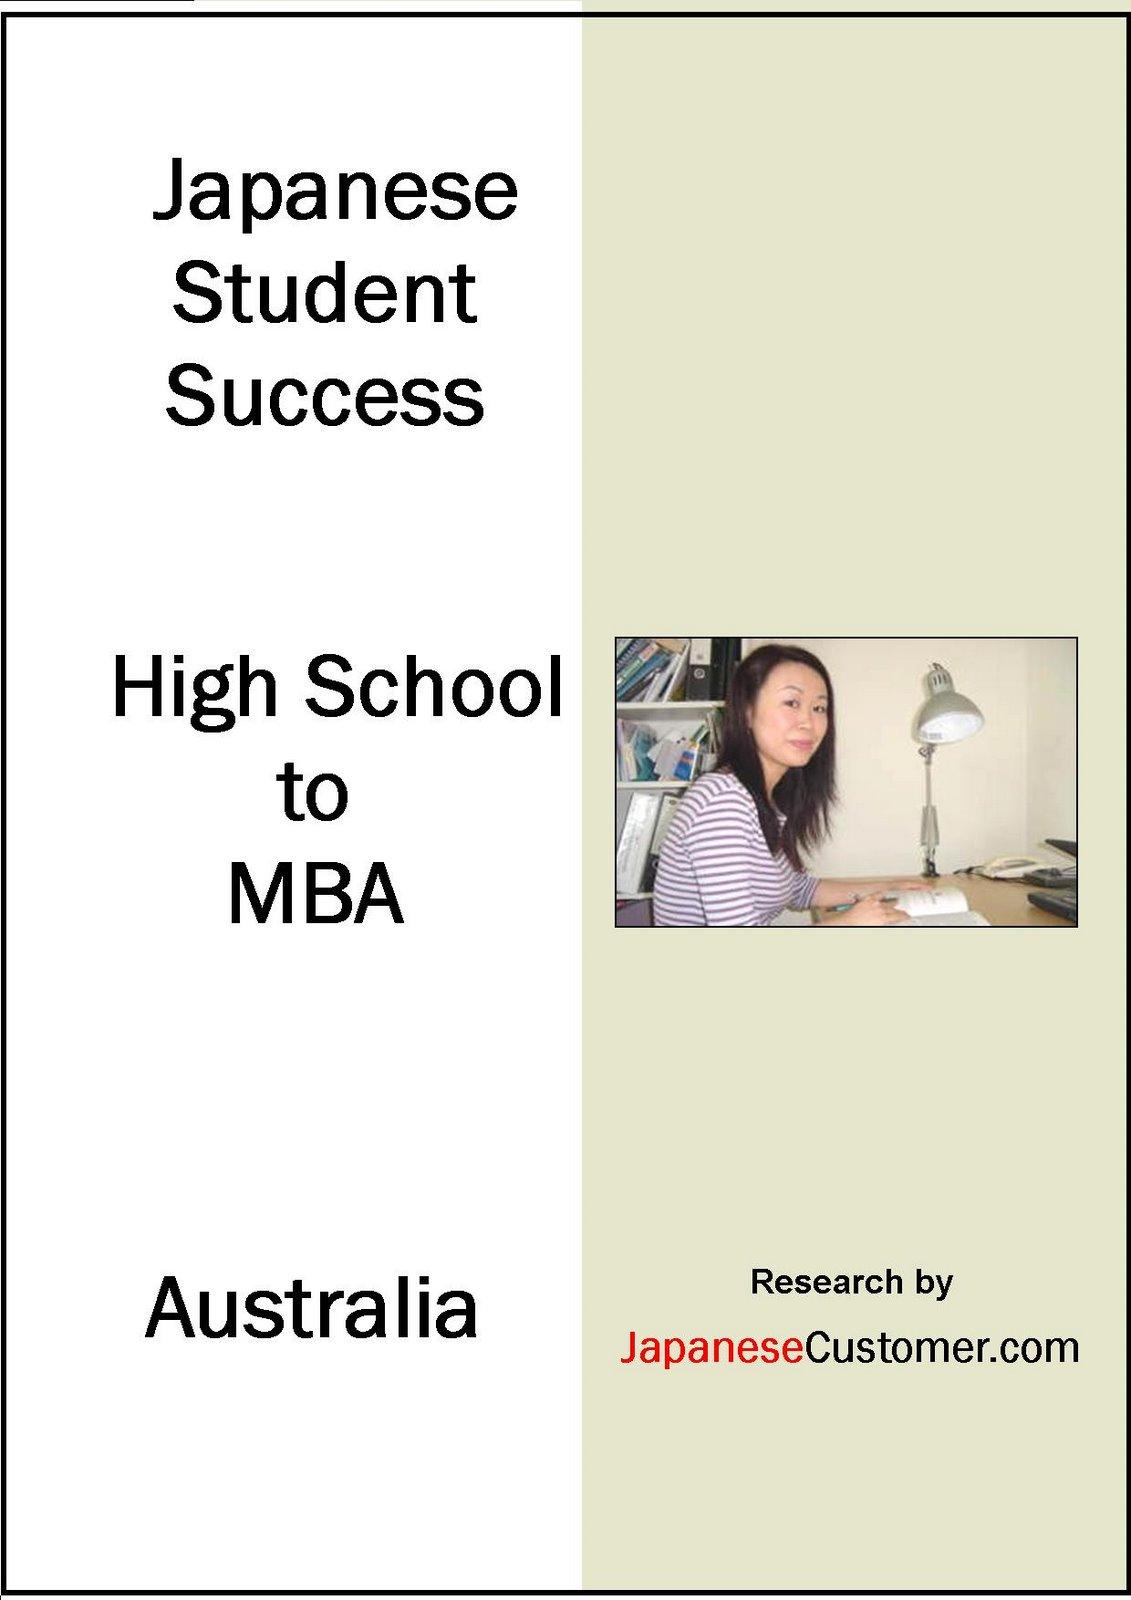 http://www.scribd.com/doc/190027019/Japanese-Student-Success-High-School-to-MBA-Australia-by-Peter-Hanami